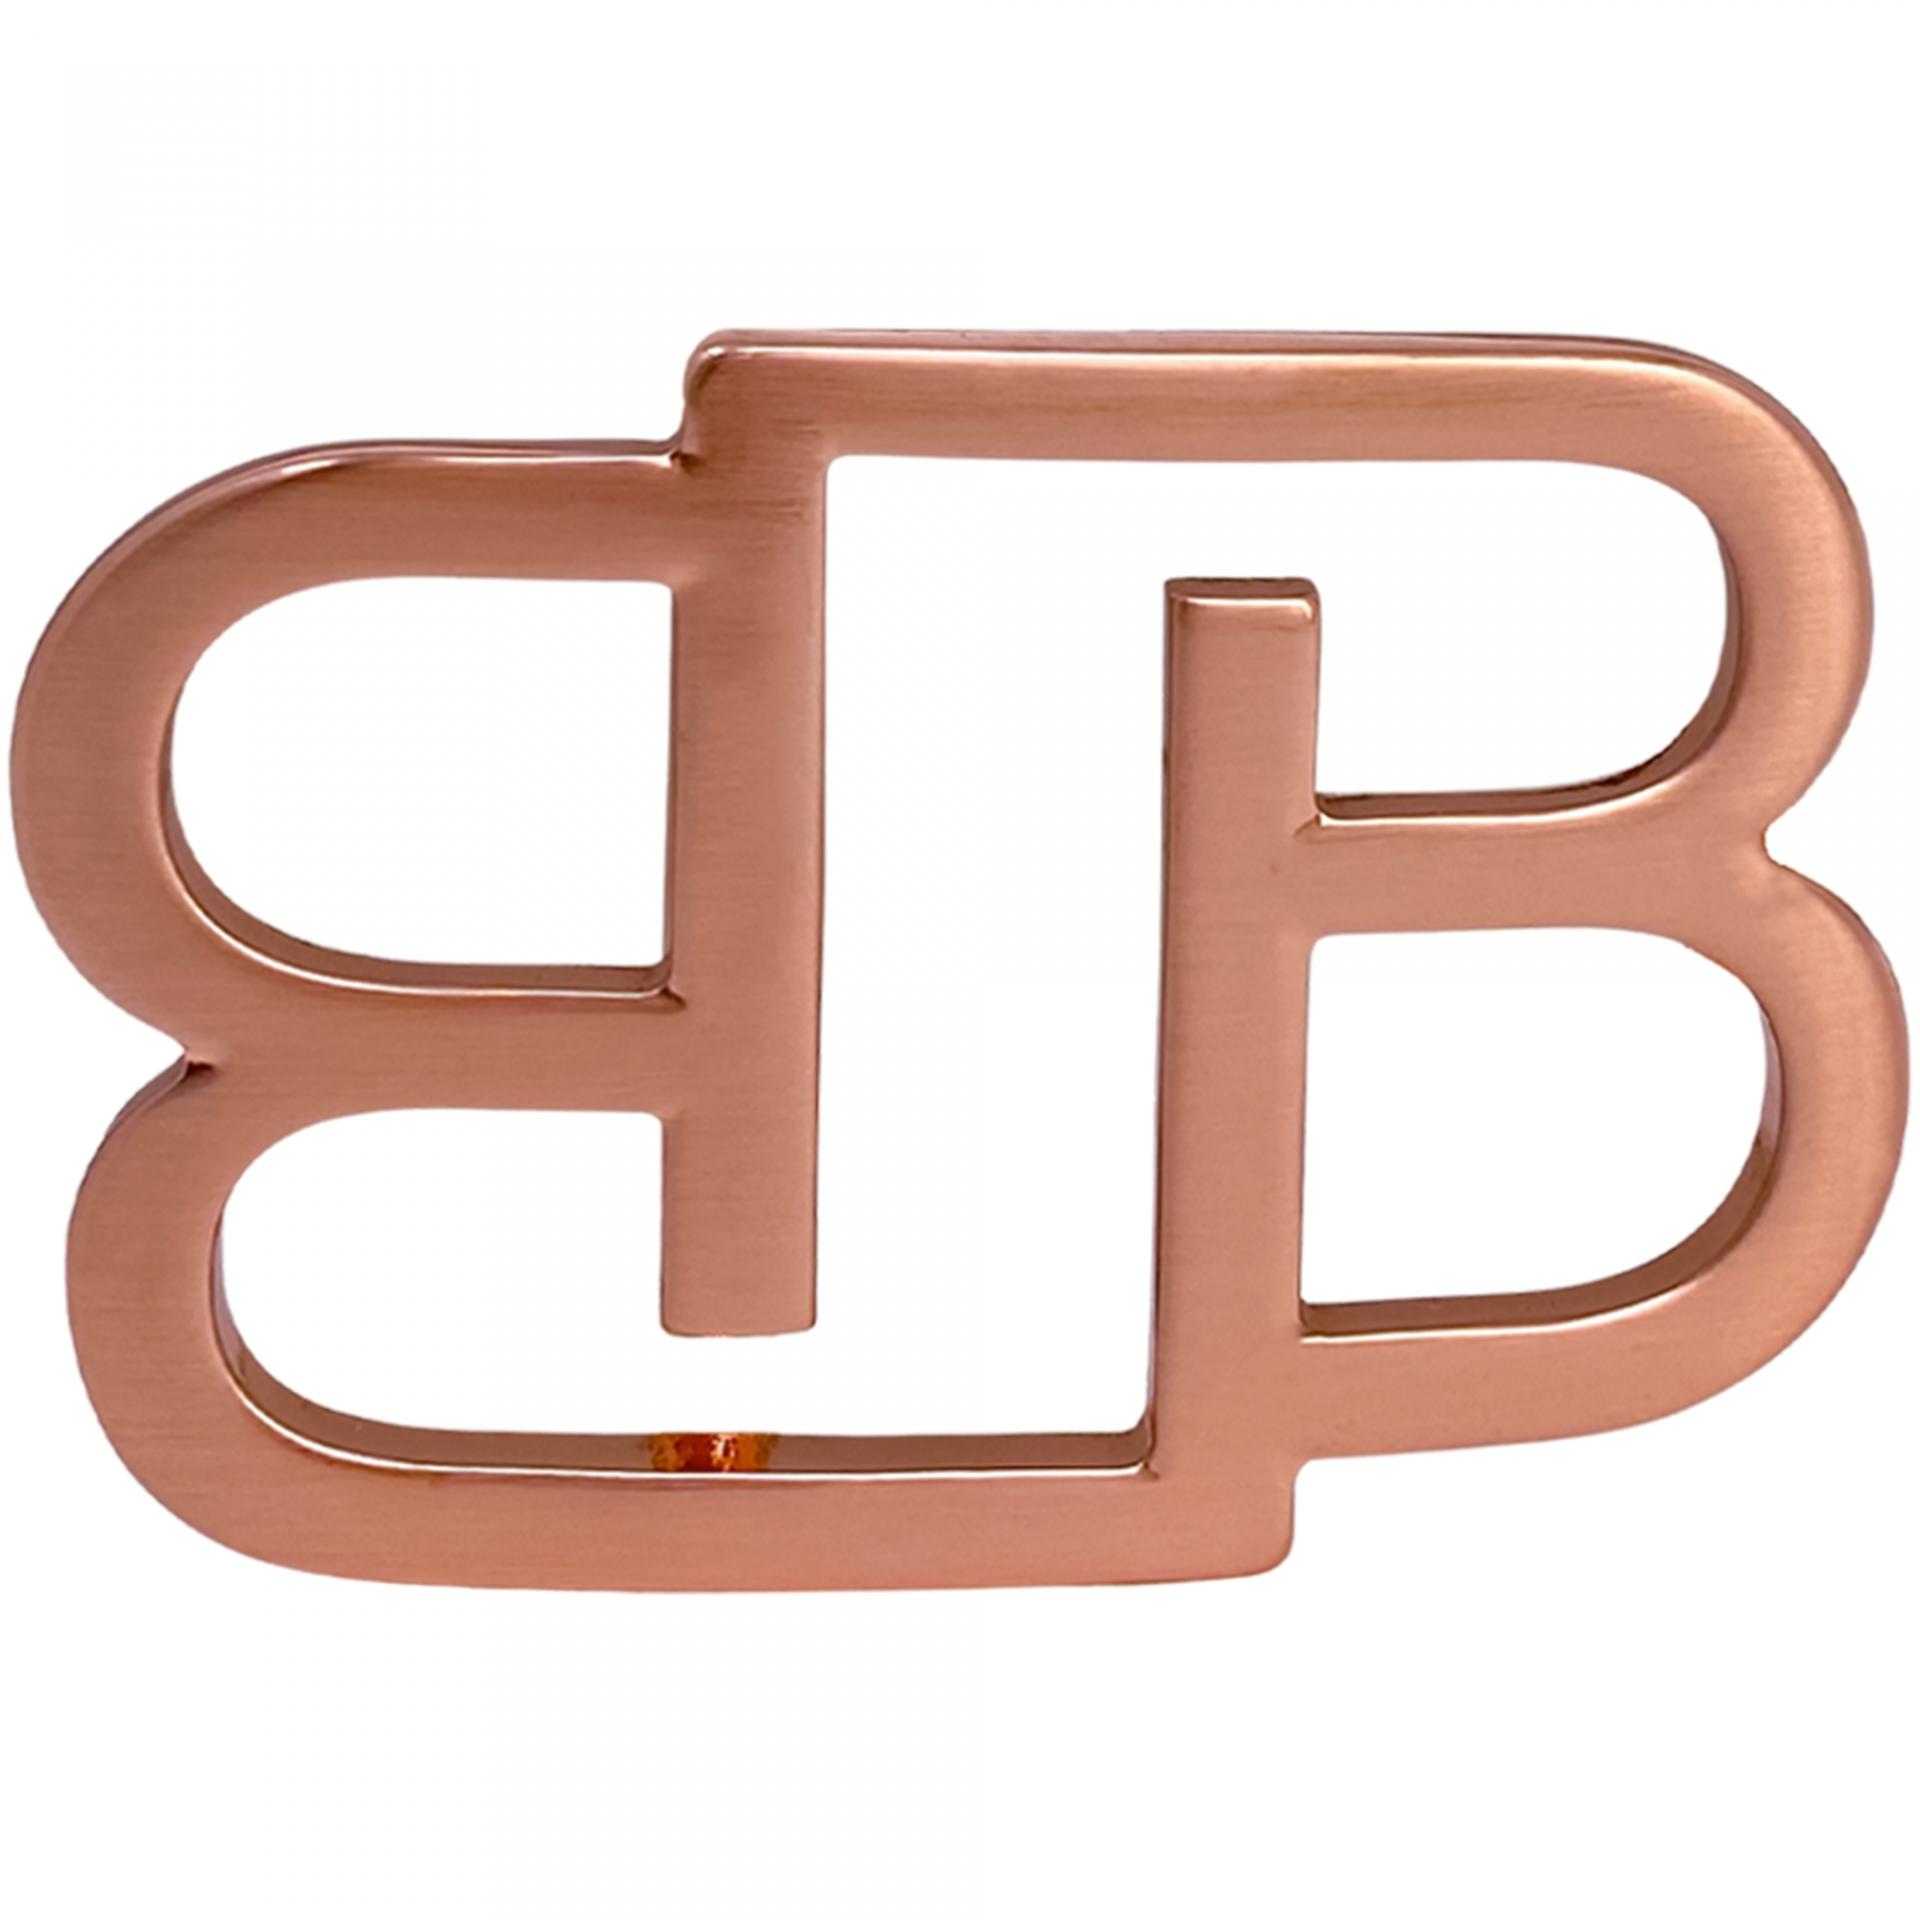 BB Buckle nickel free 35 mm, pink sand